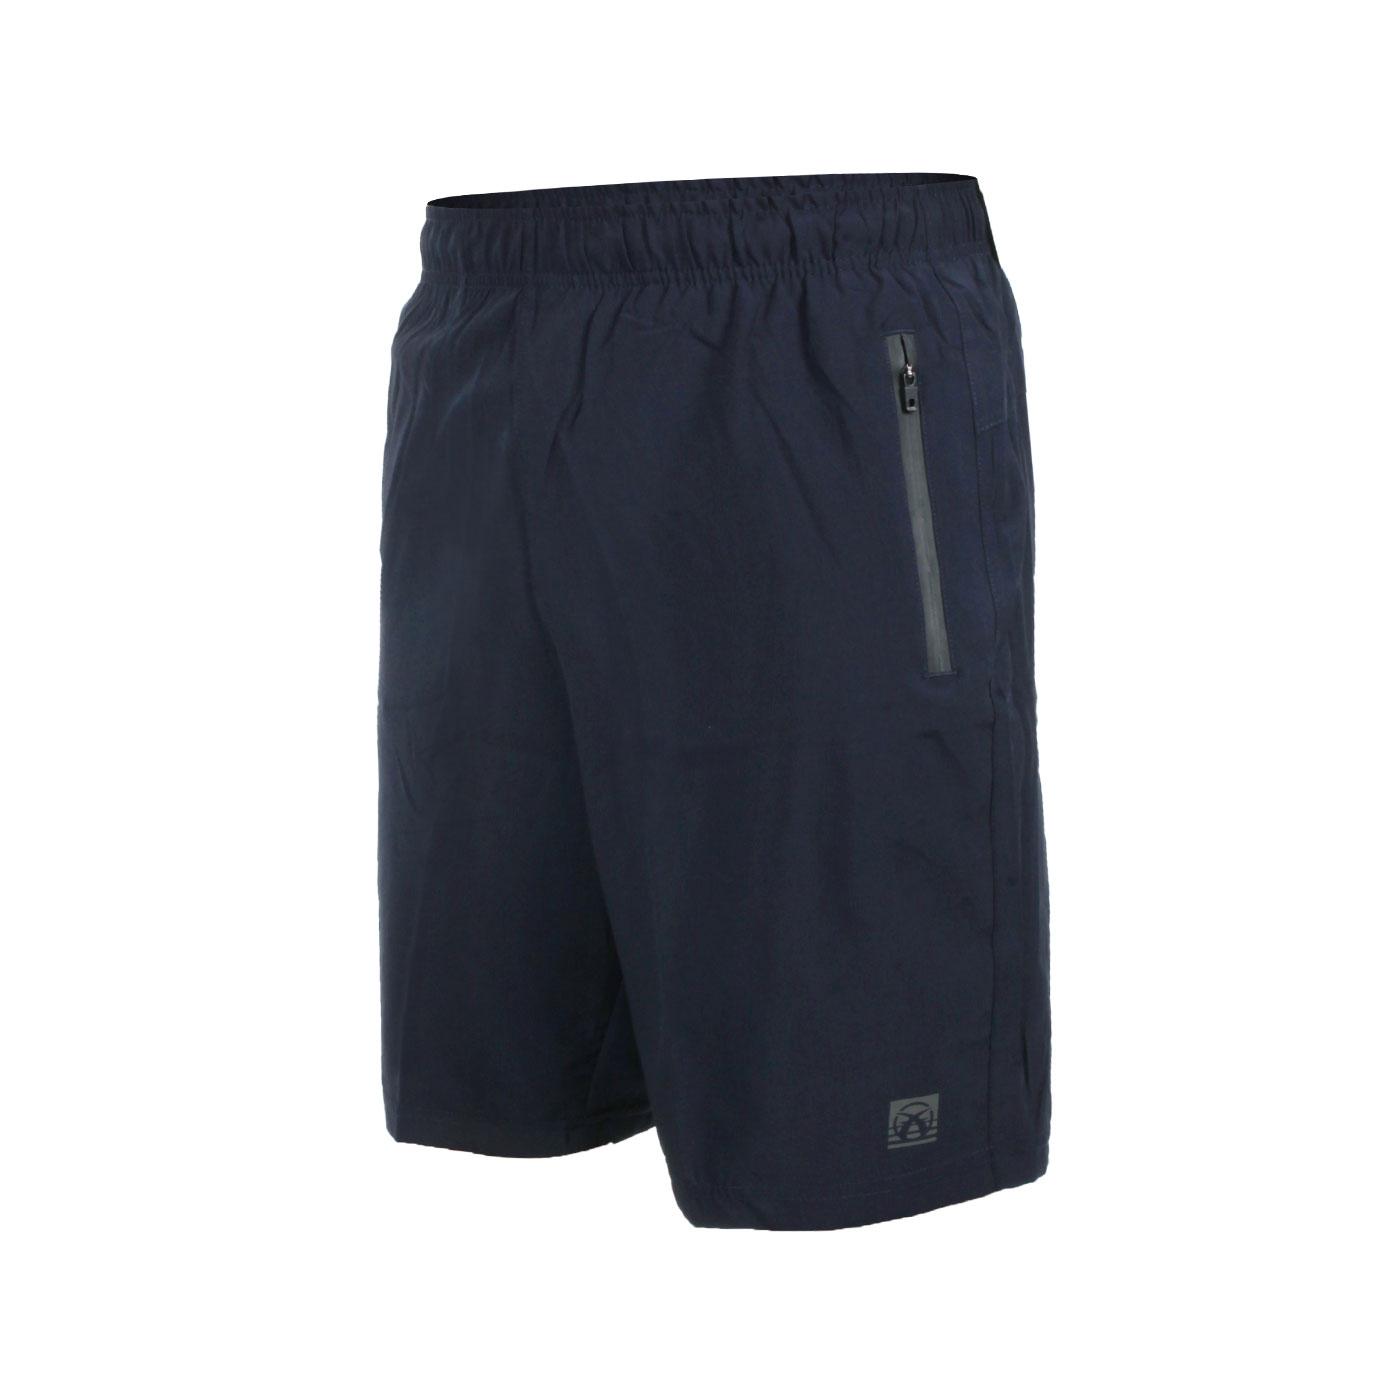 FIRESTAR 男款彈性平織短褲 C1718-93